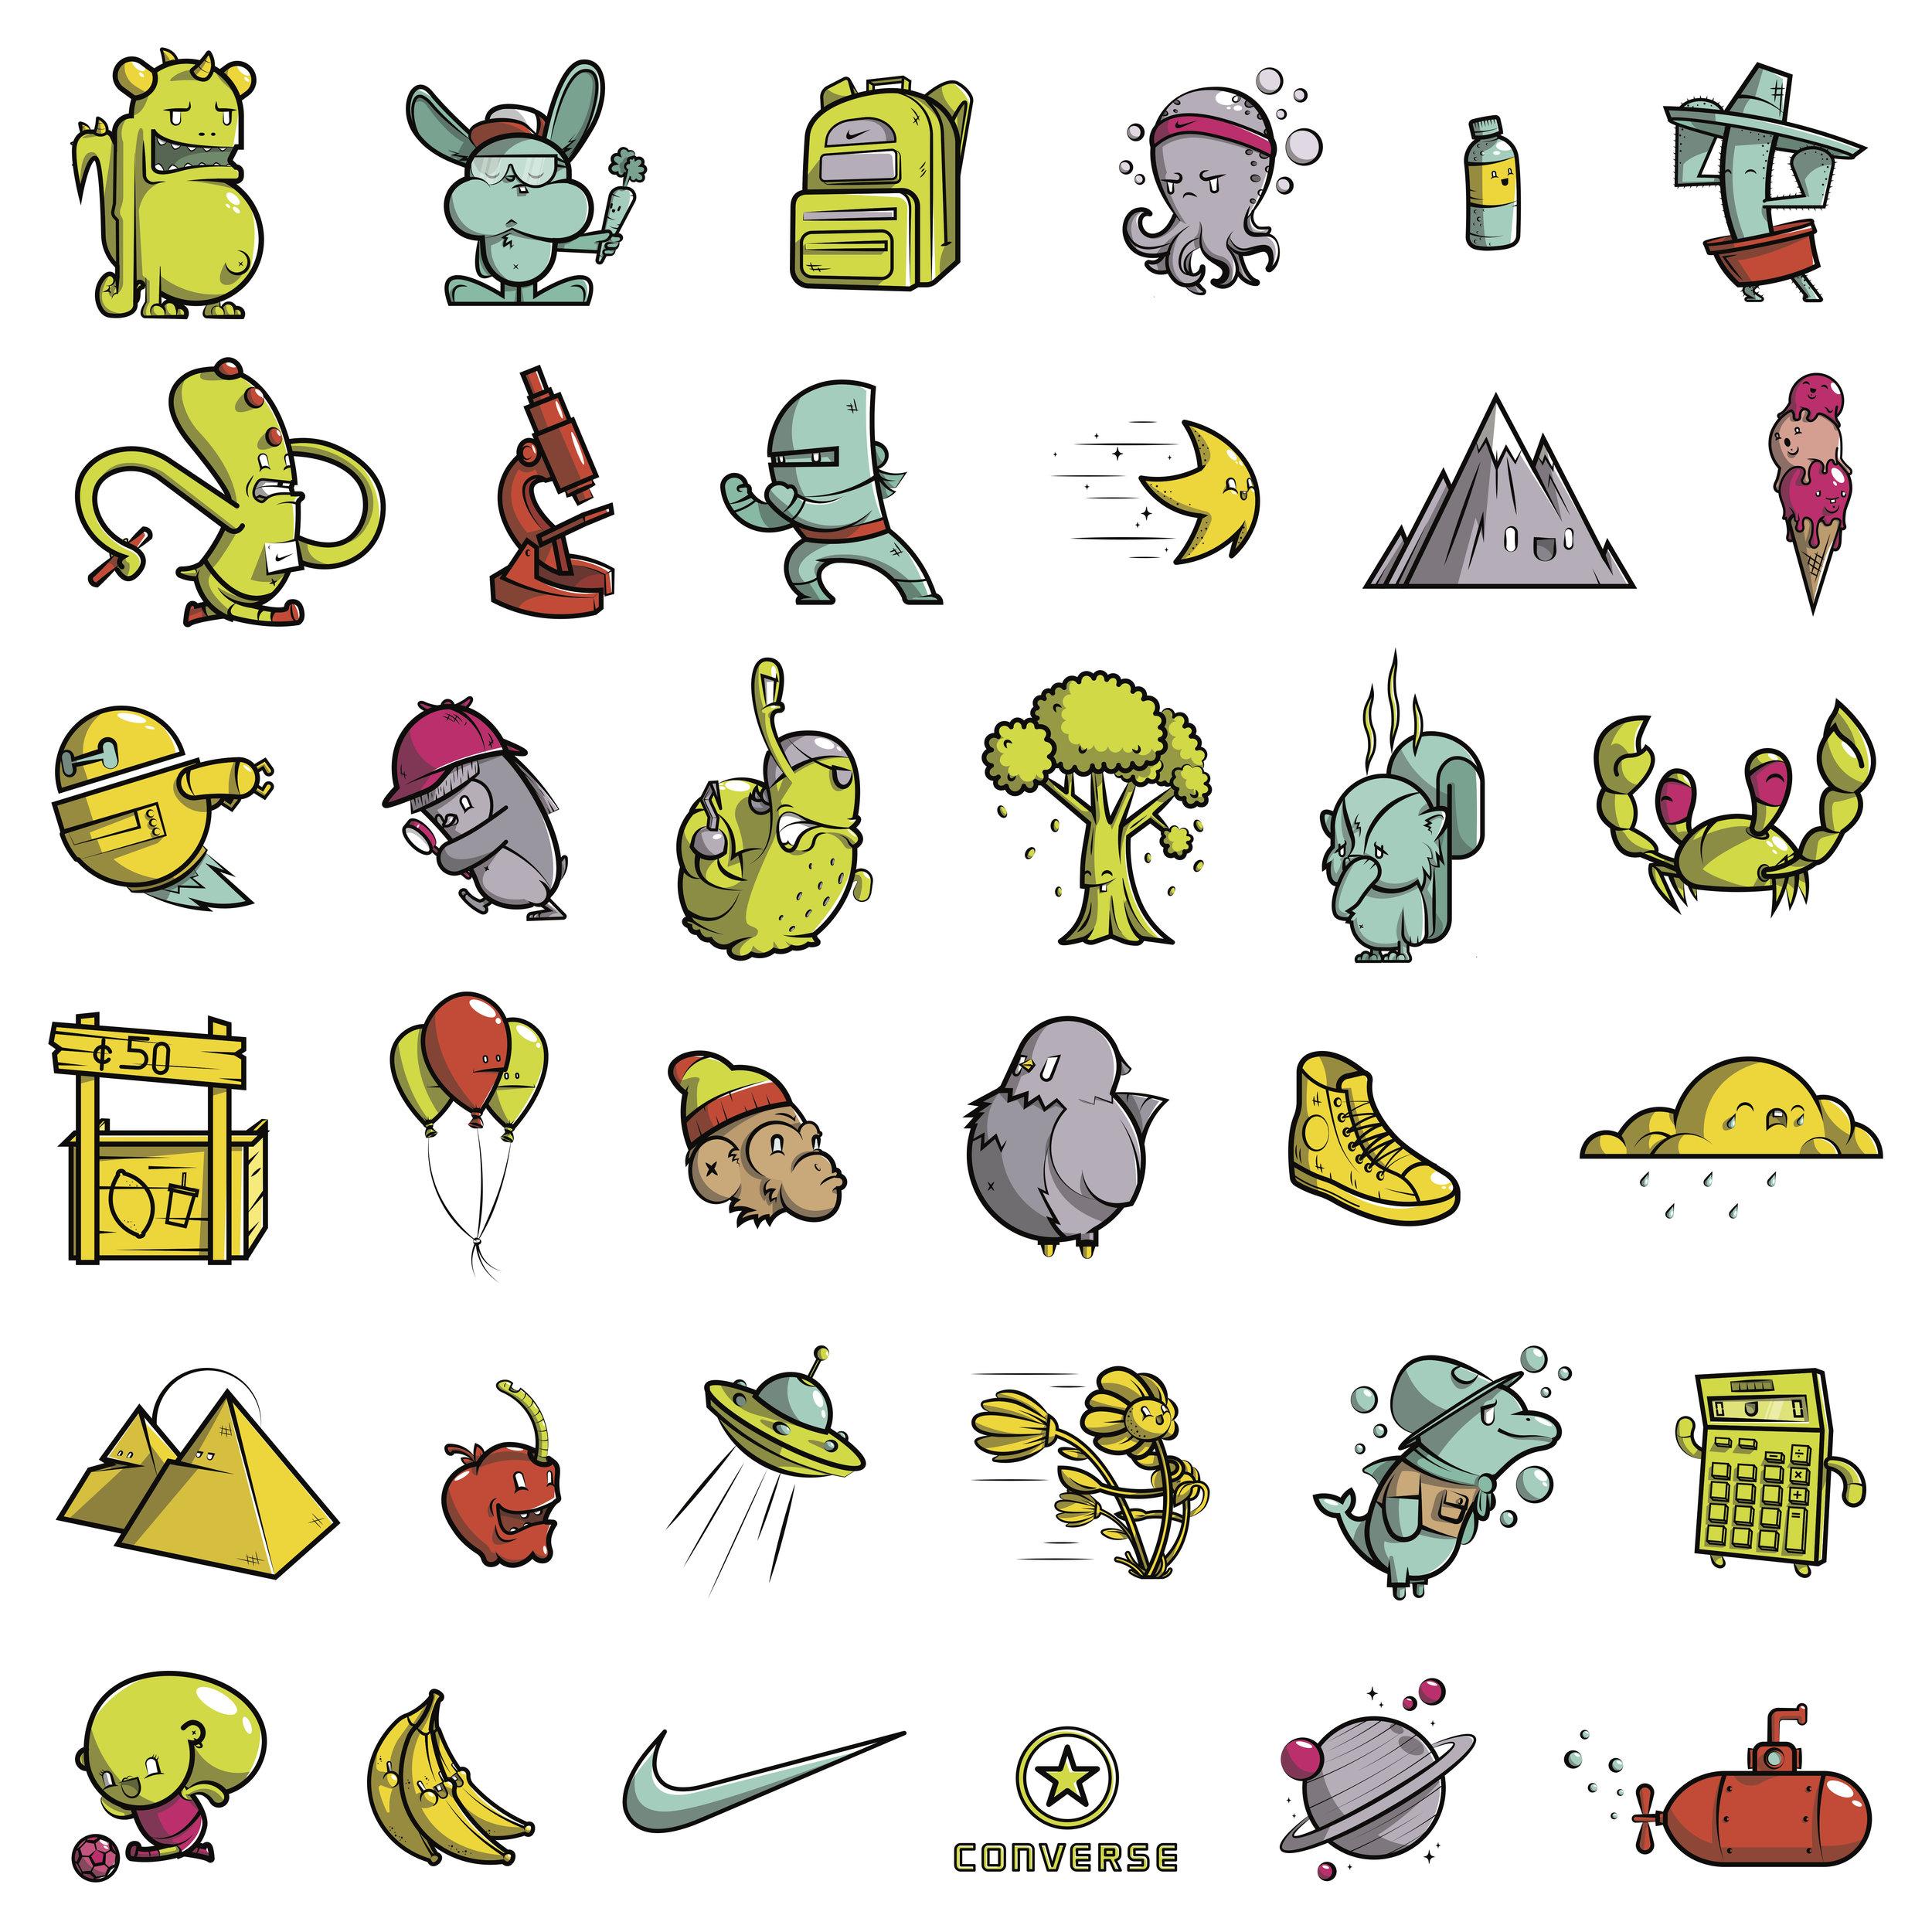 charactersquare.jpg